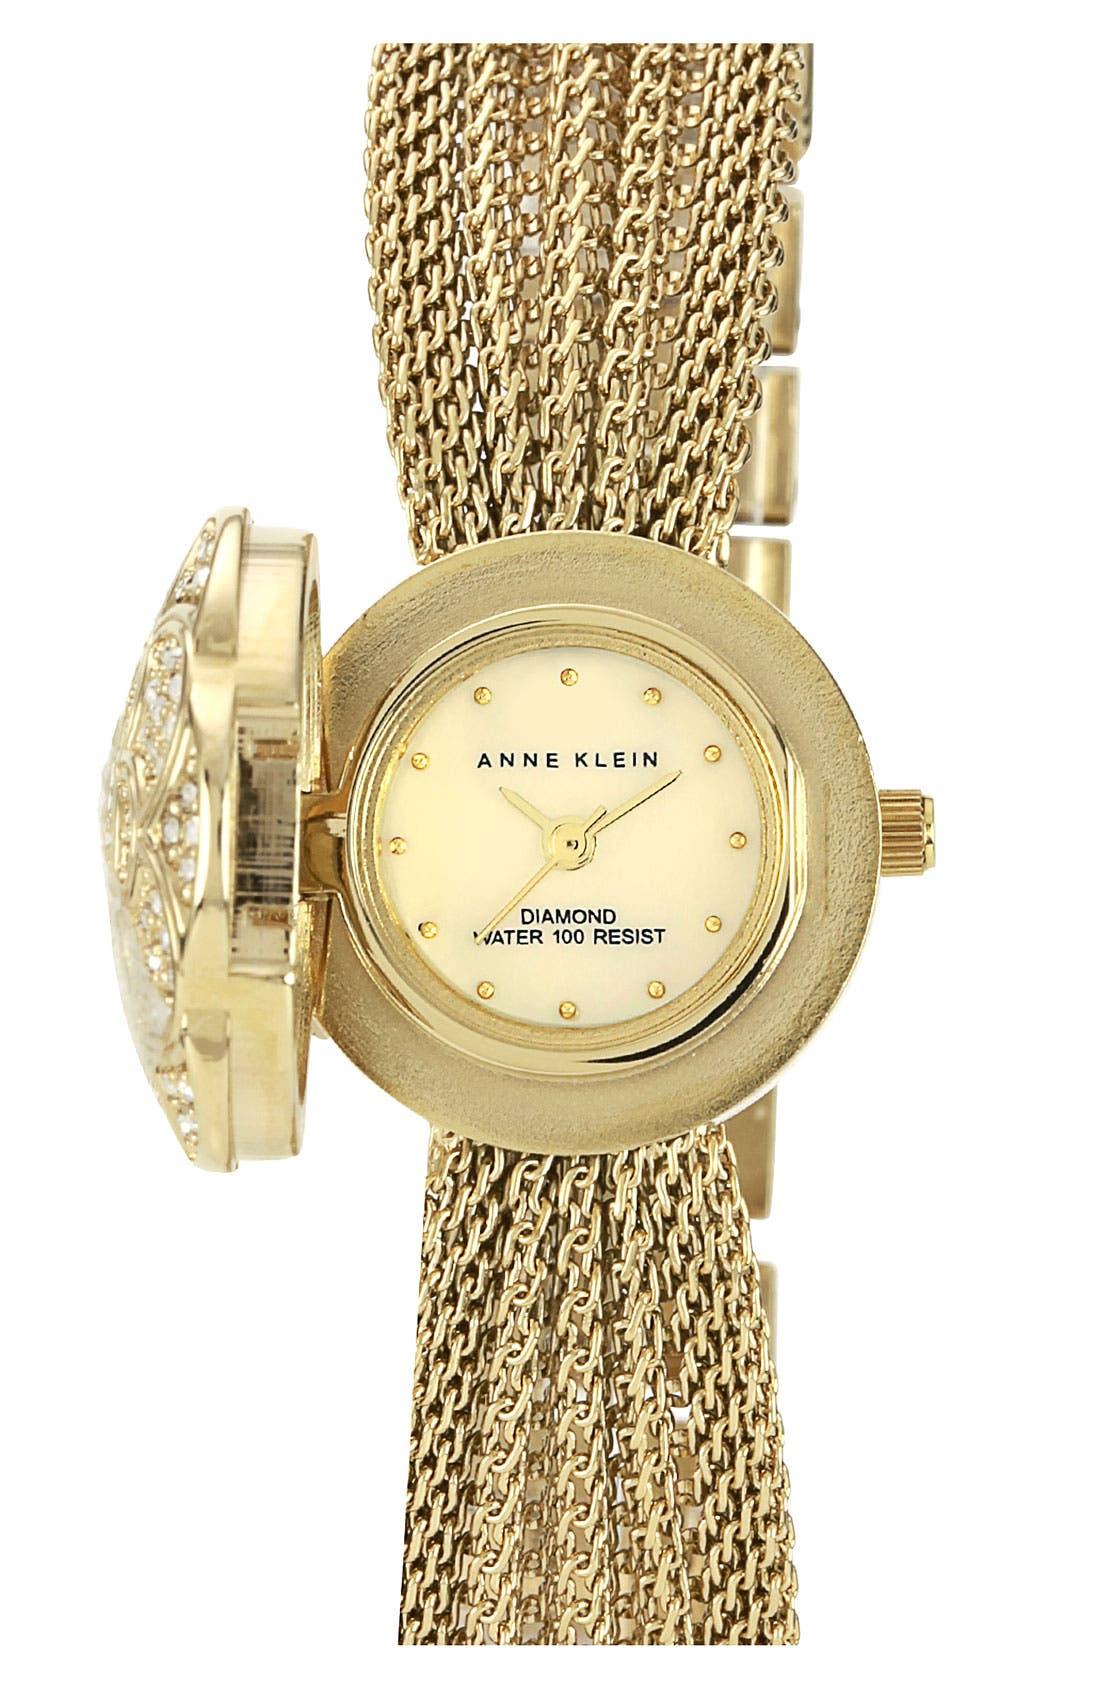 Alternate Image 1 Selected - Anne Klein Flower Case Chain Bracelet Watch, 18mm